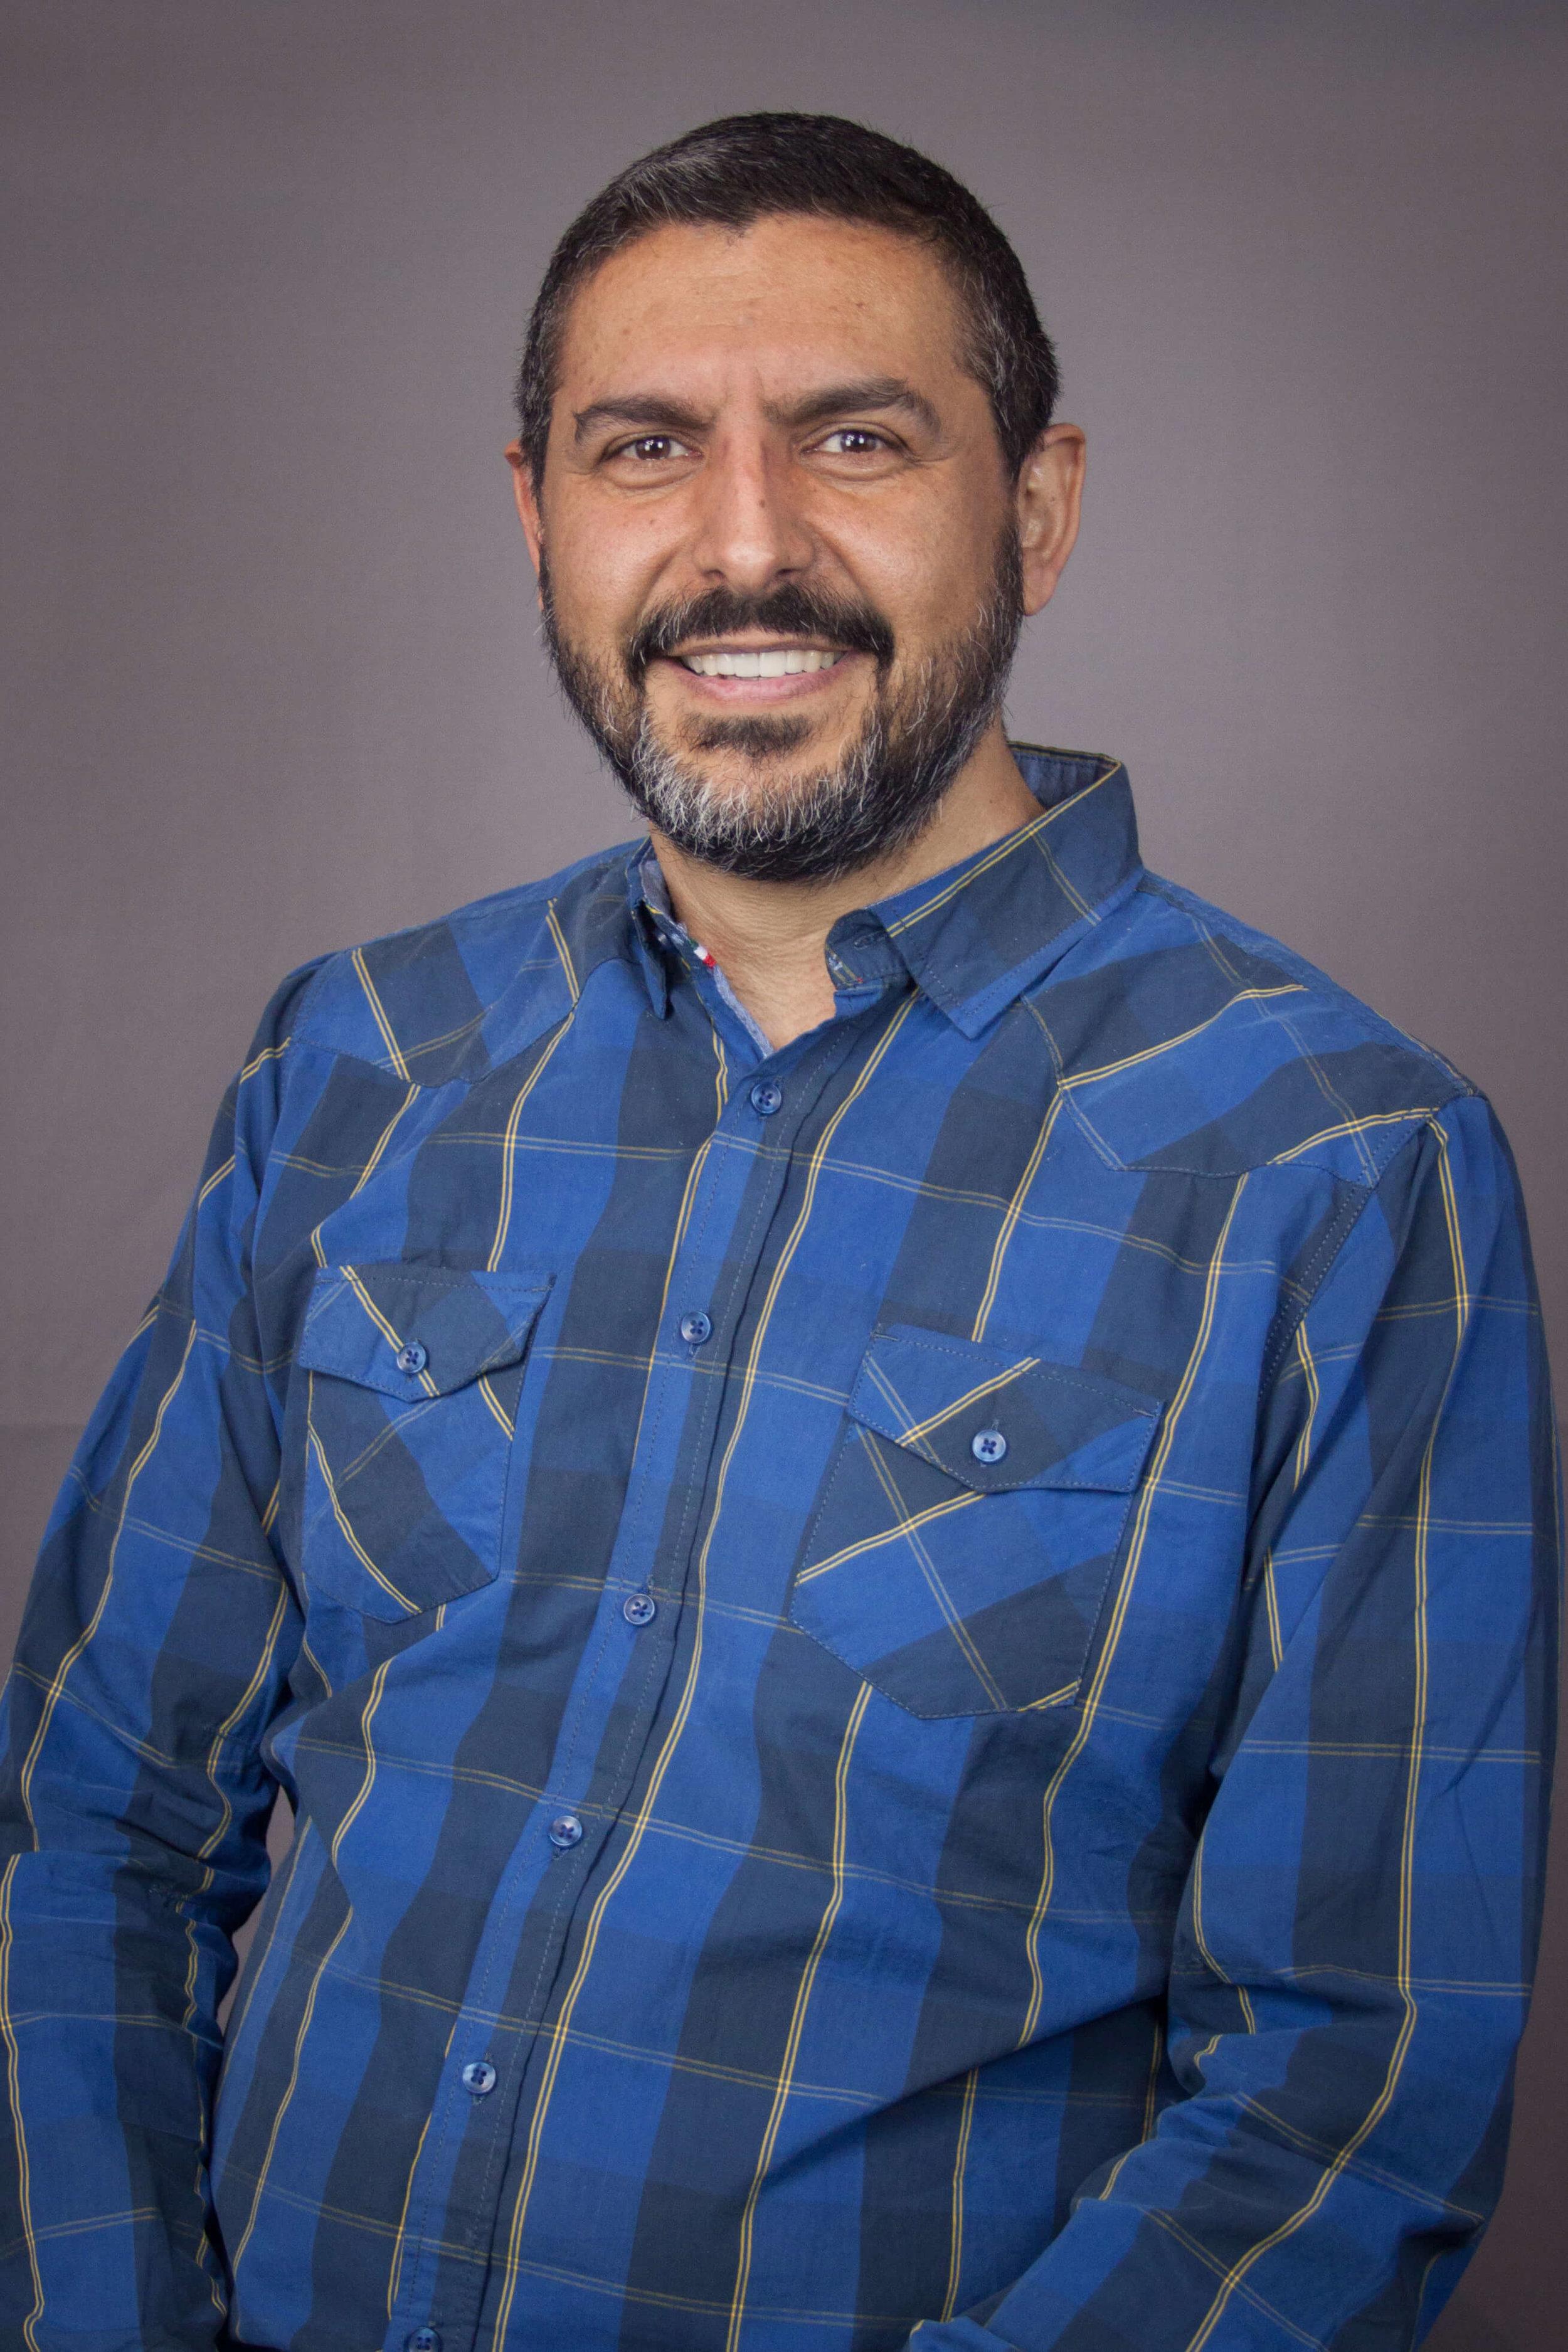 Marco Quarteroli.  pastor@crosspointadventist.com   Senior Pastor